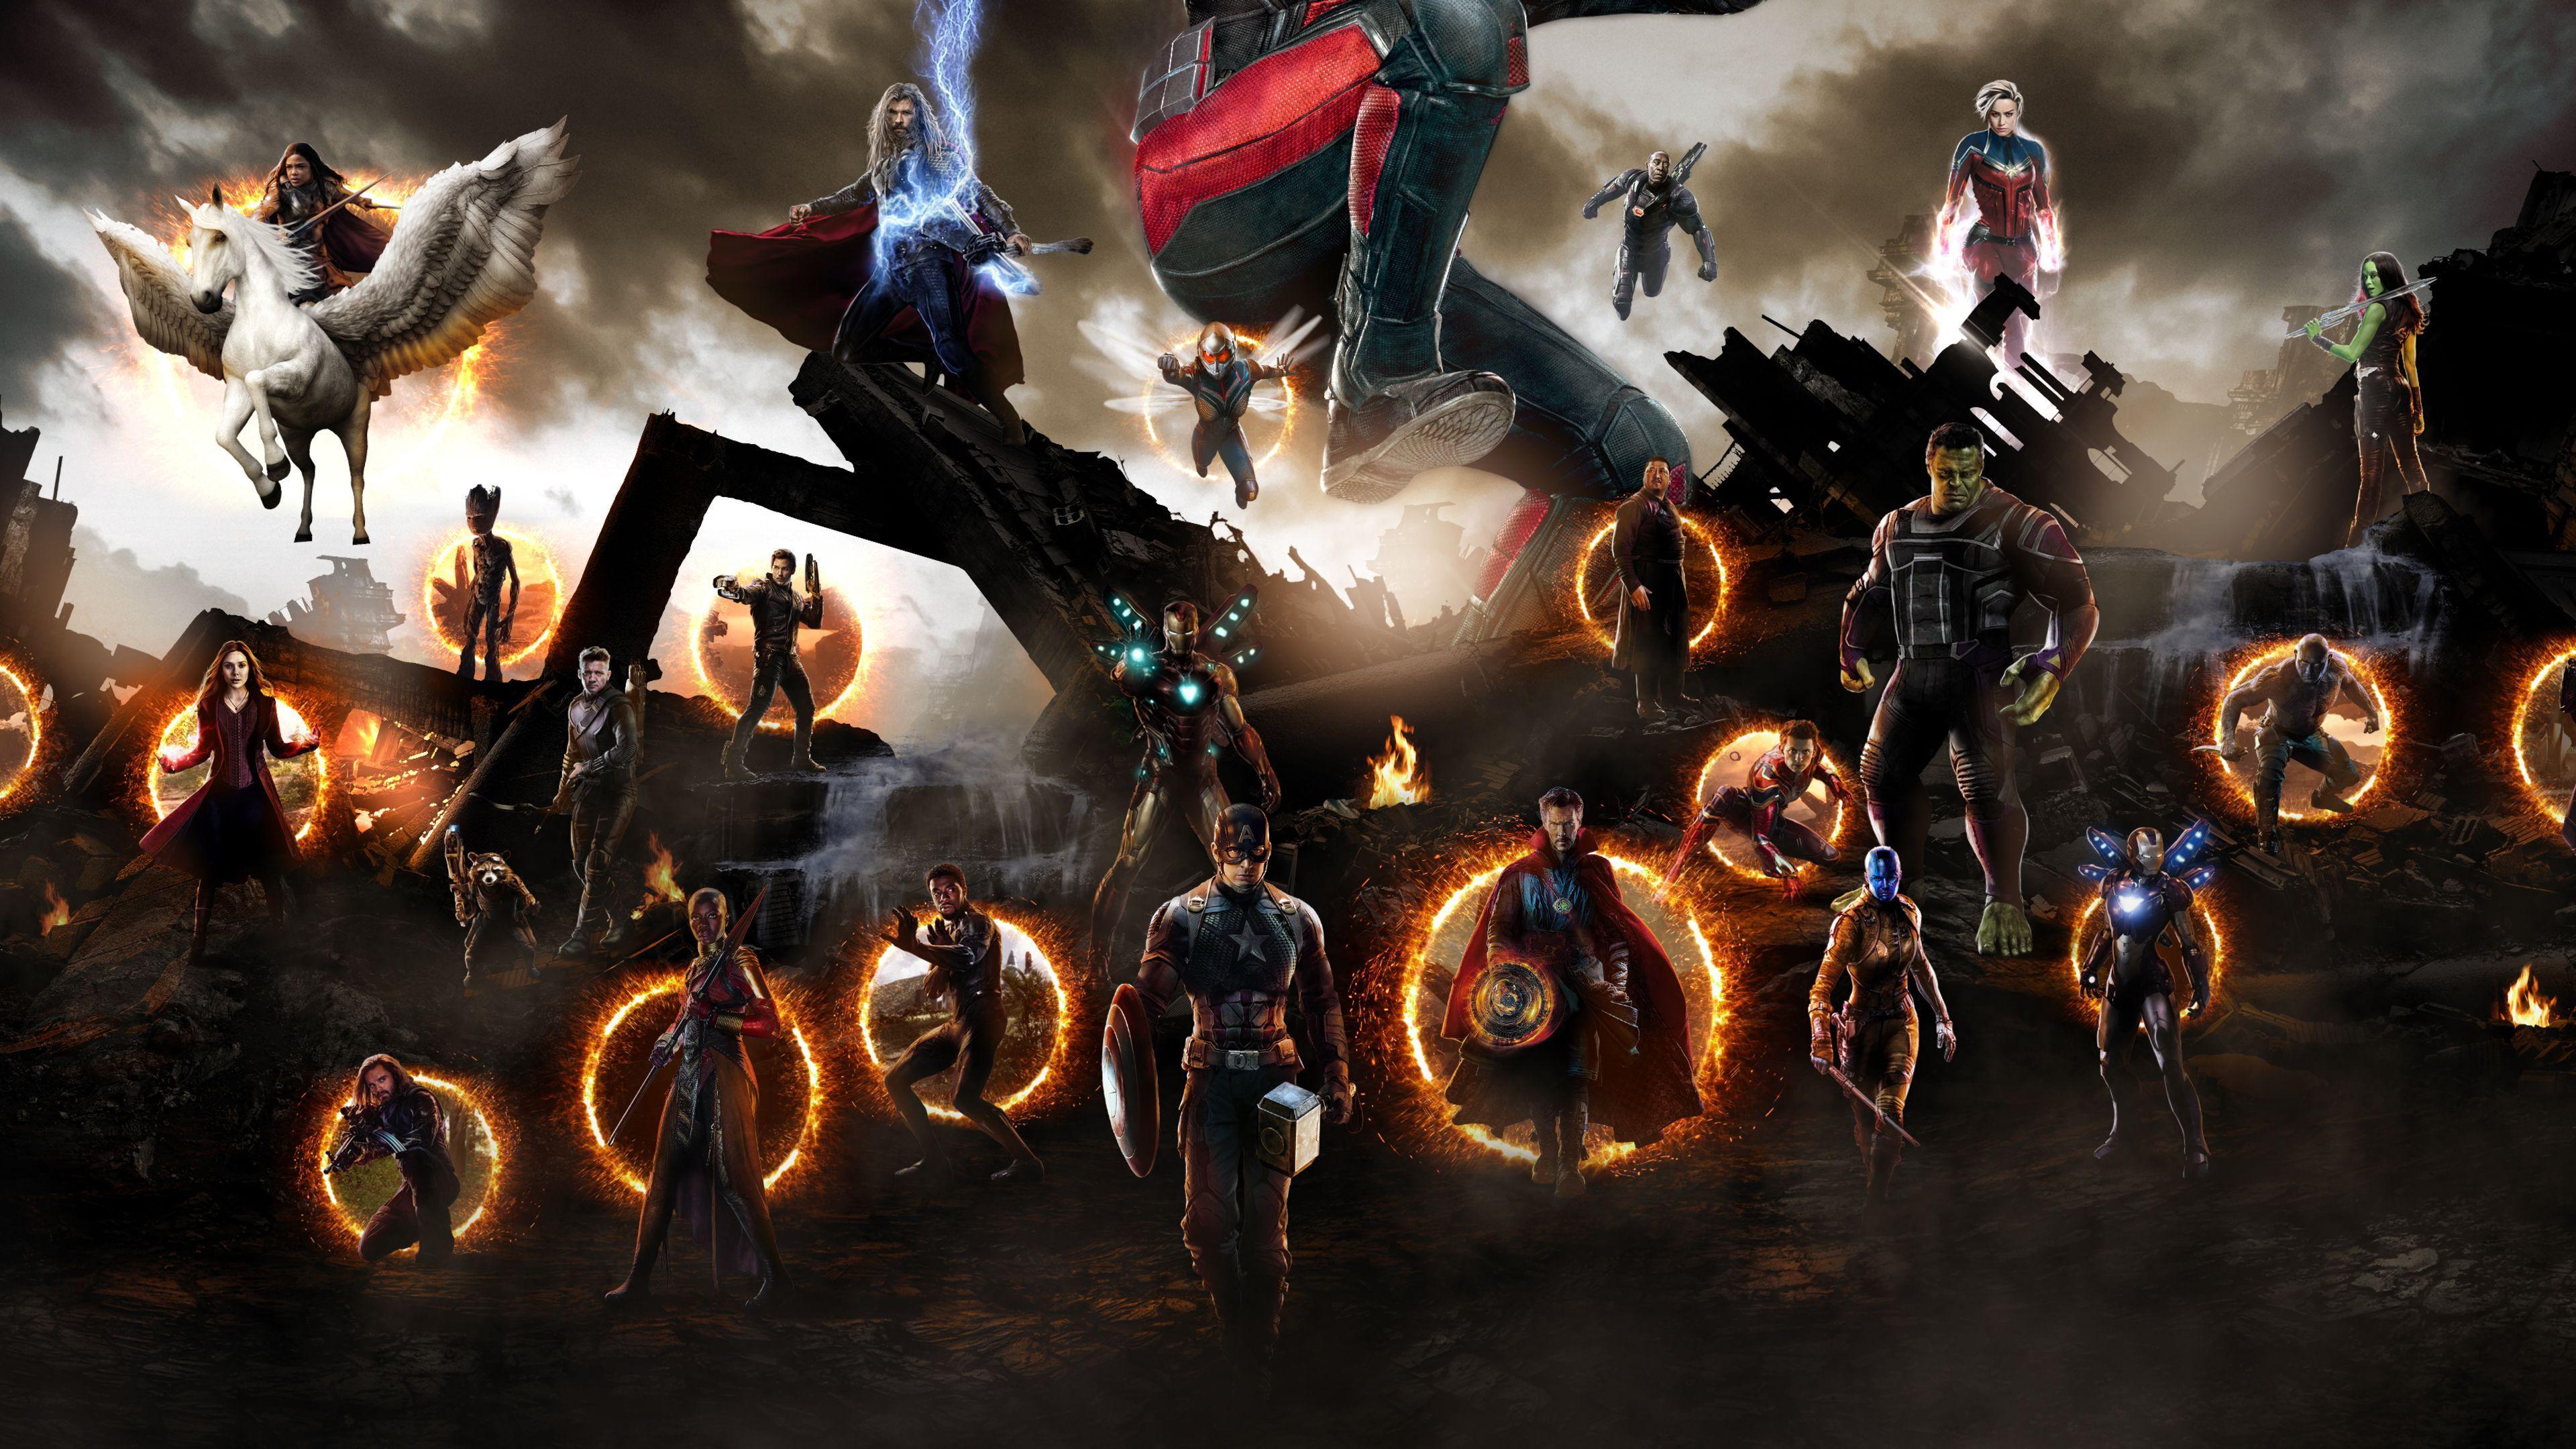 Avengers Endgame Final Battle Wallpapers Wallpaper Cave